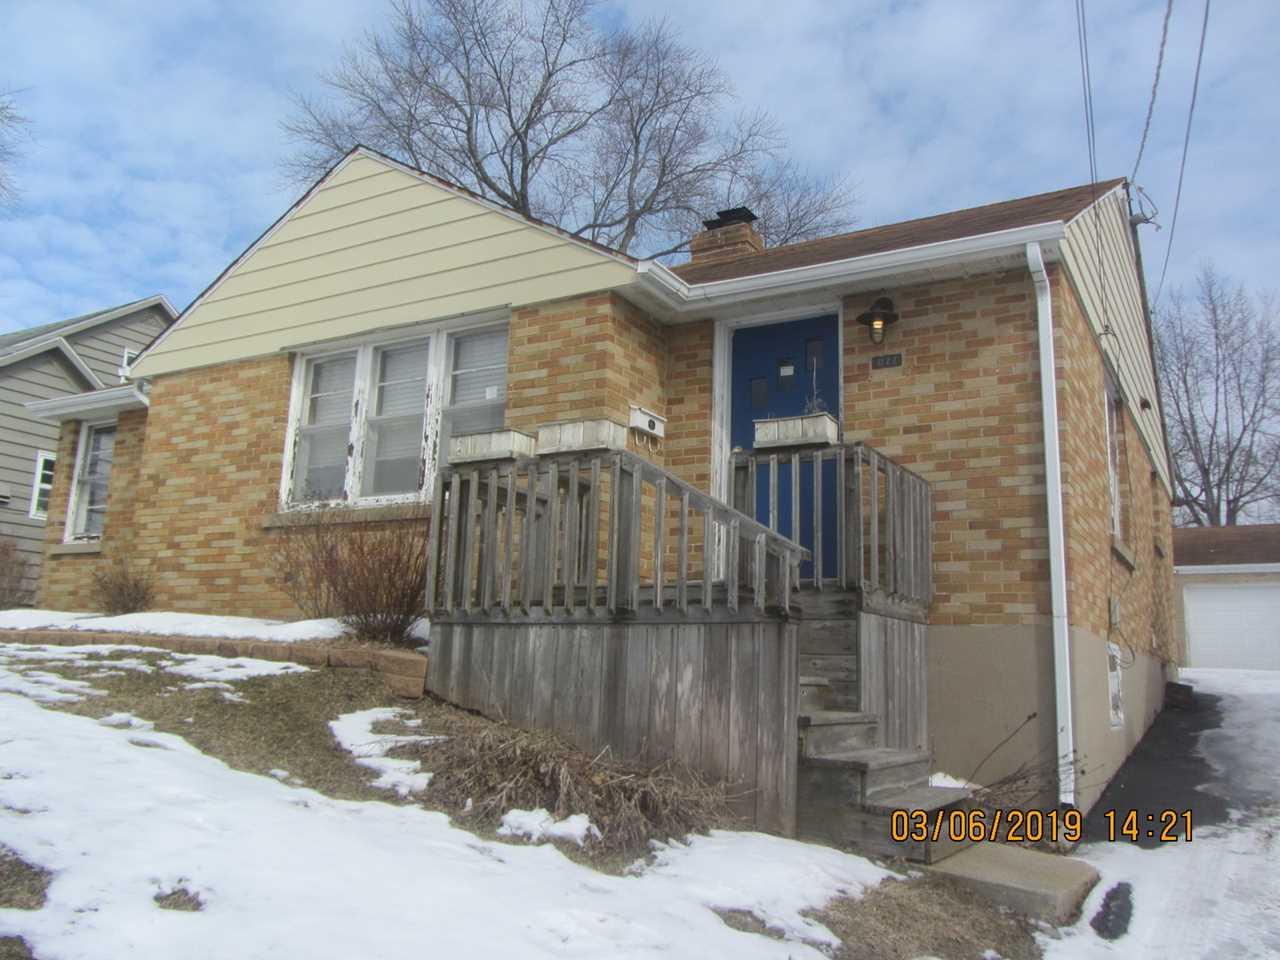 611 Putnam Ave Woodstock, IL 60098 | MLS 10305113 Photo 1